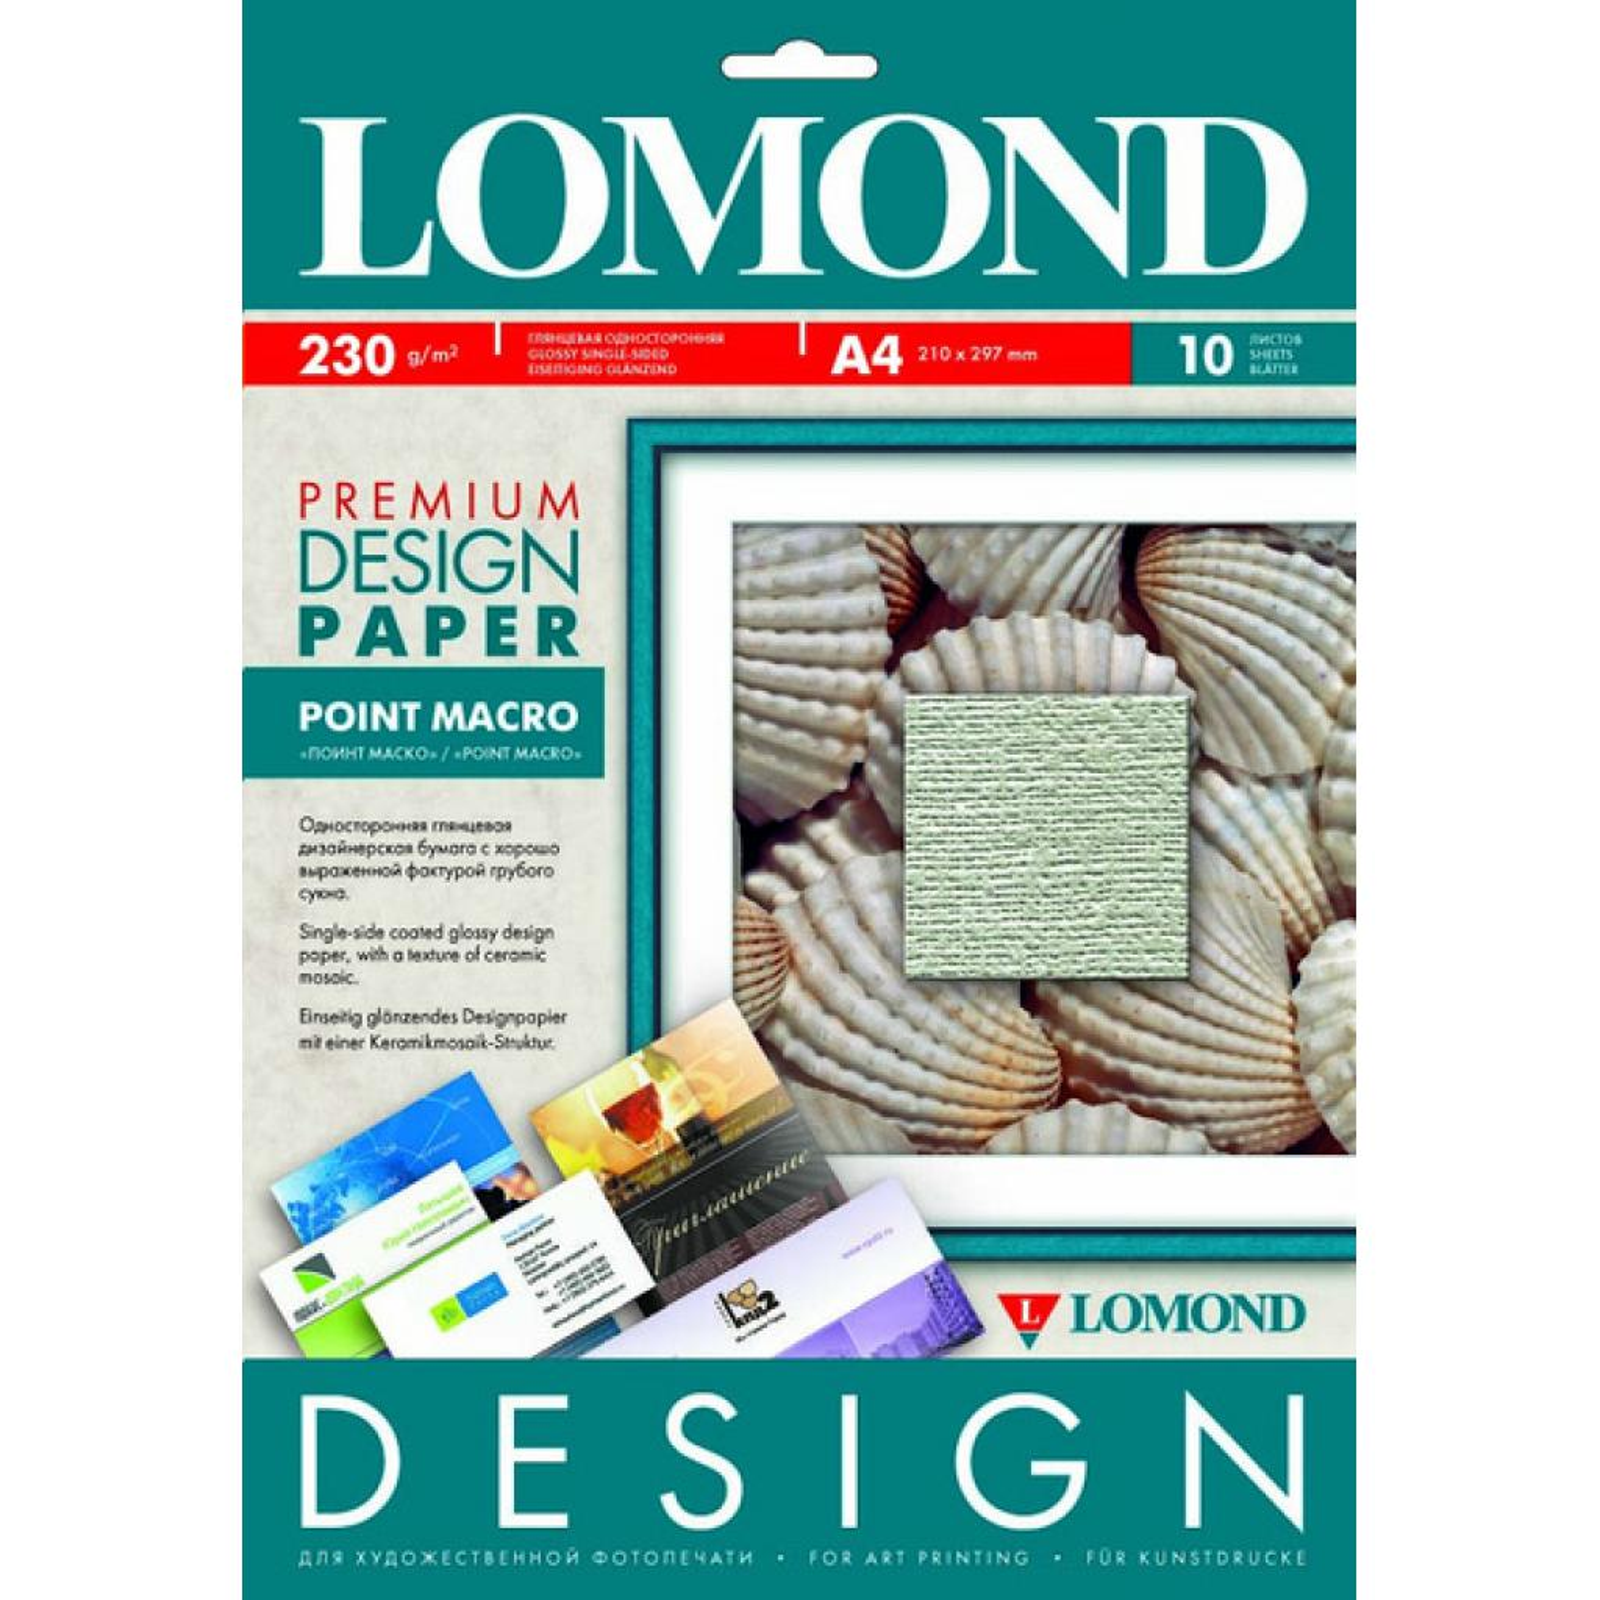 Бумага Lomond A4 Design Premium Point Macro 230 (0931041)